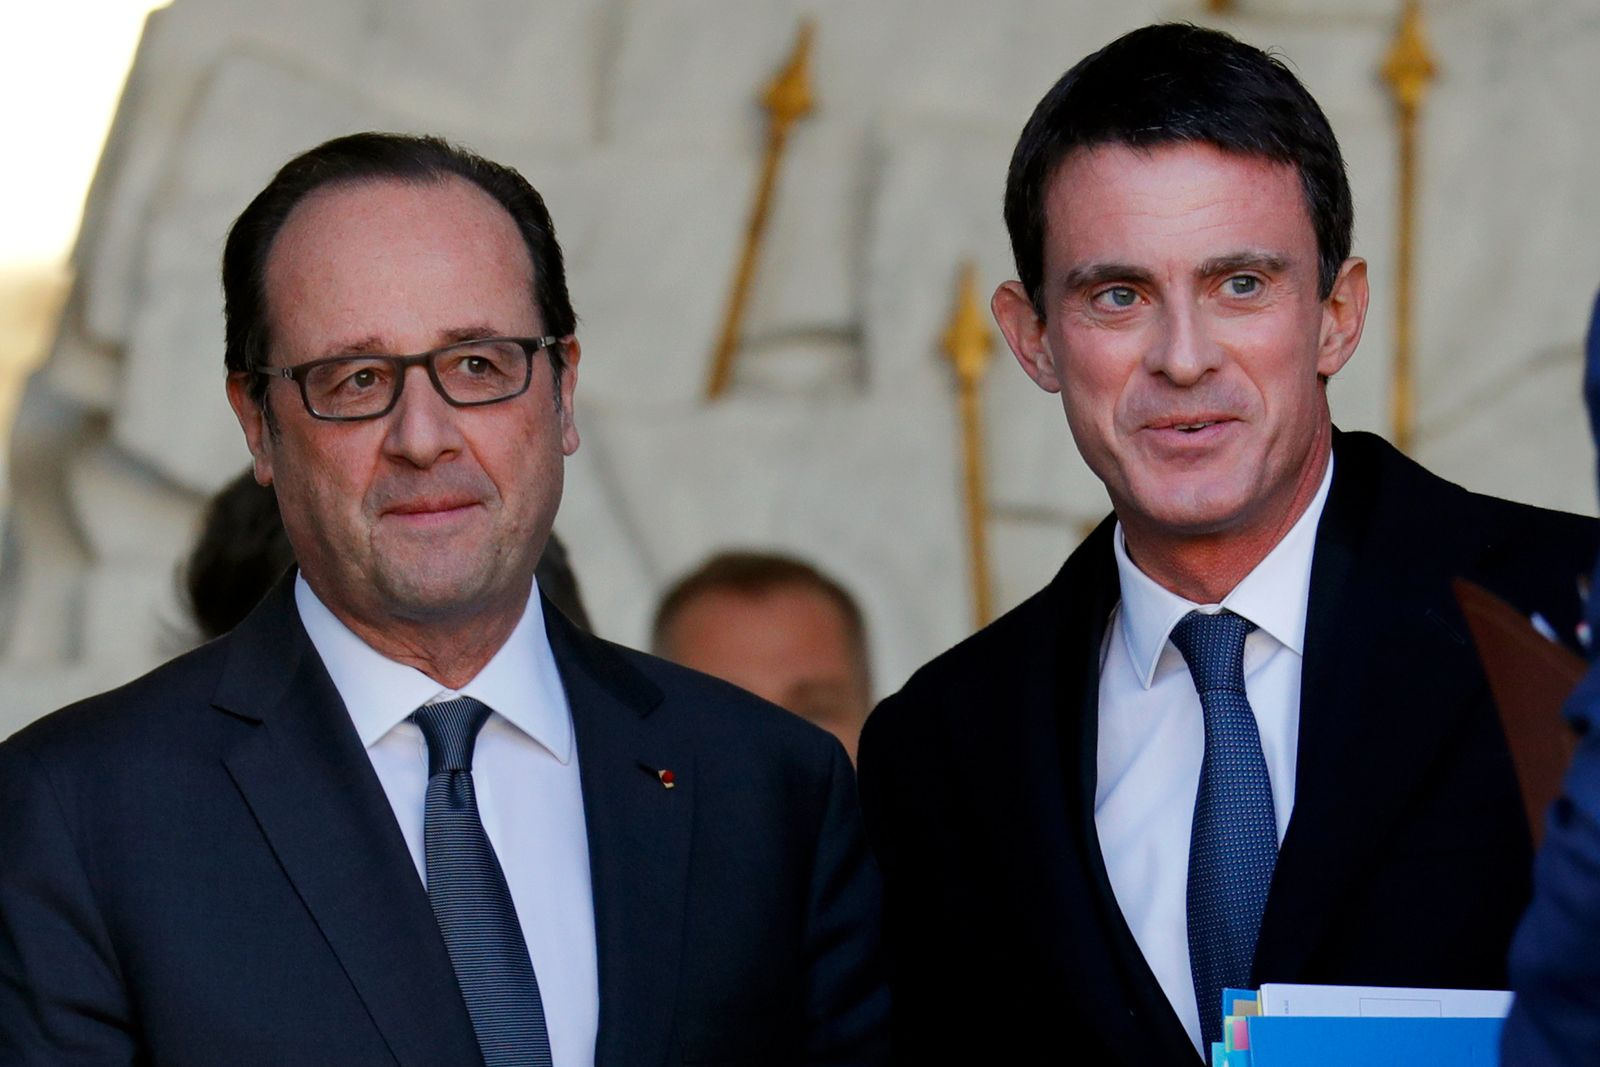 Francois Hollande / Manuel Valls